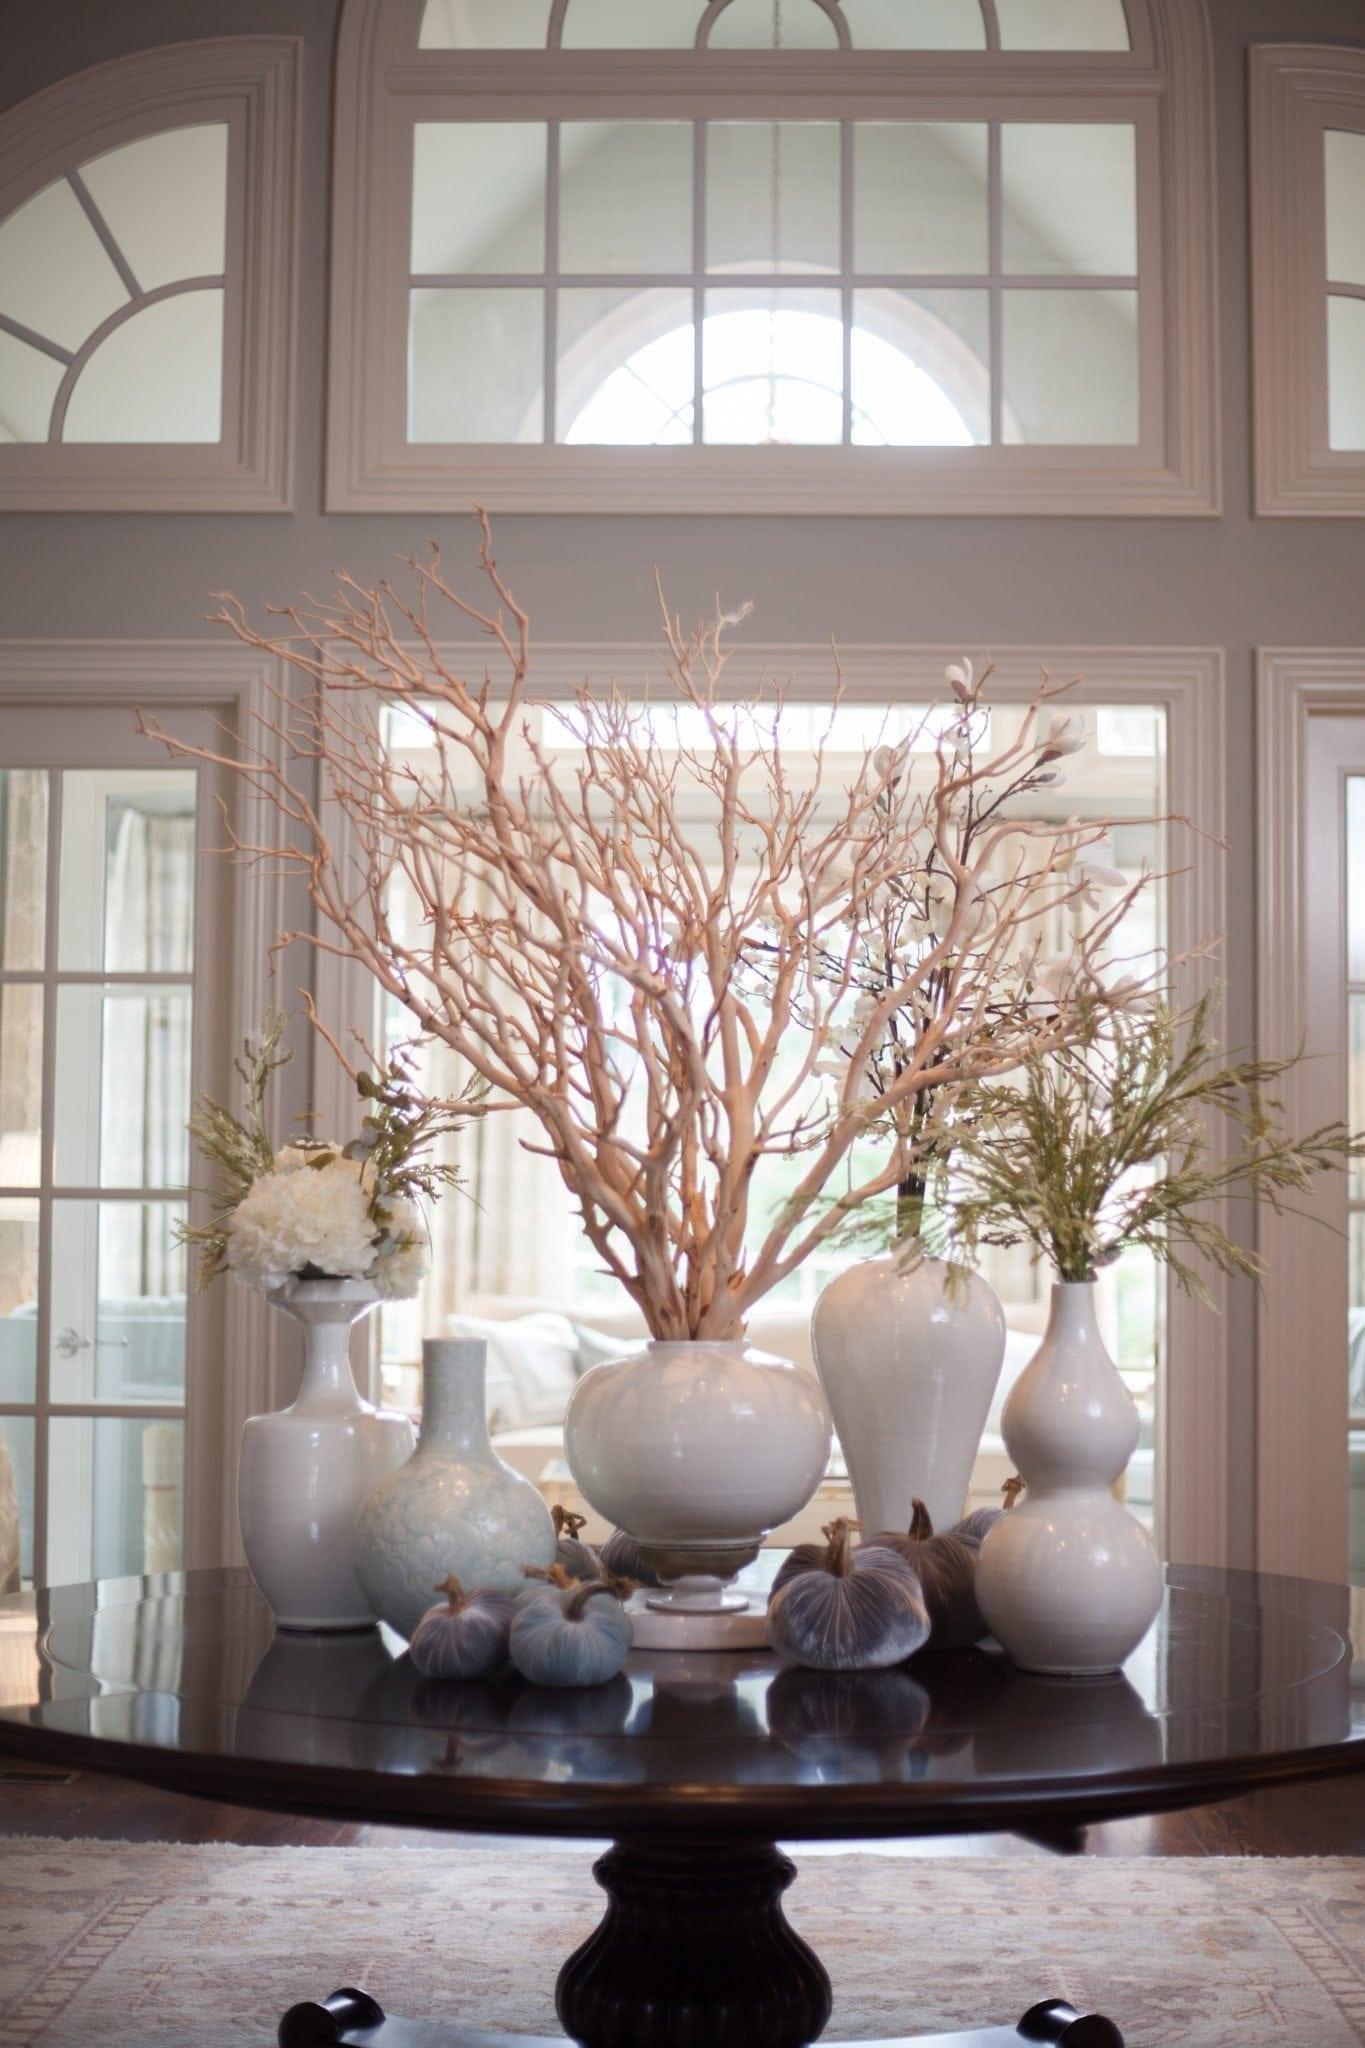 Centerpiece for round dining room table. Manzanita branch centerpiece idea.